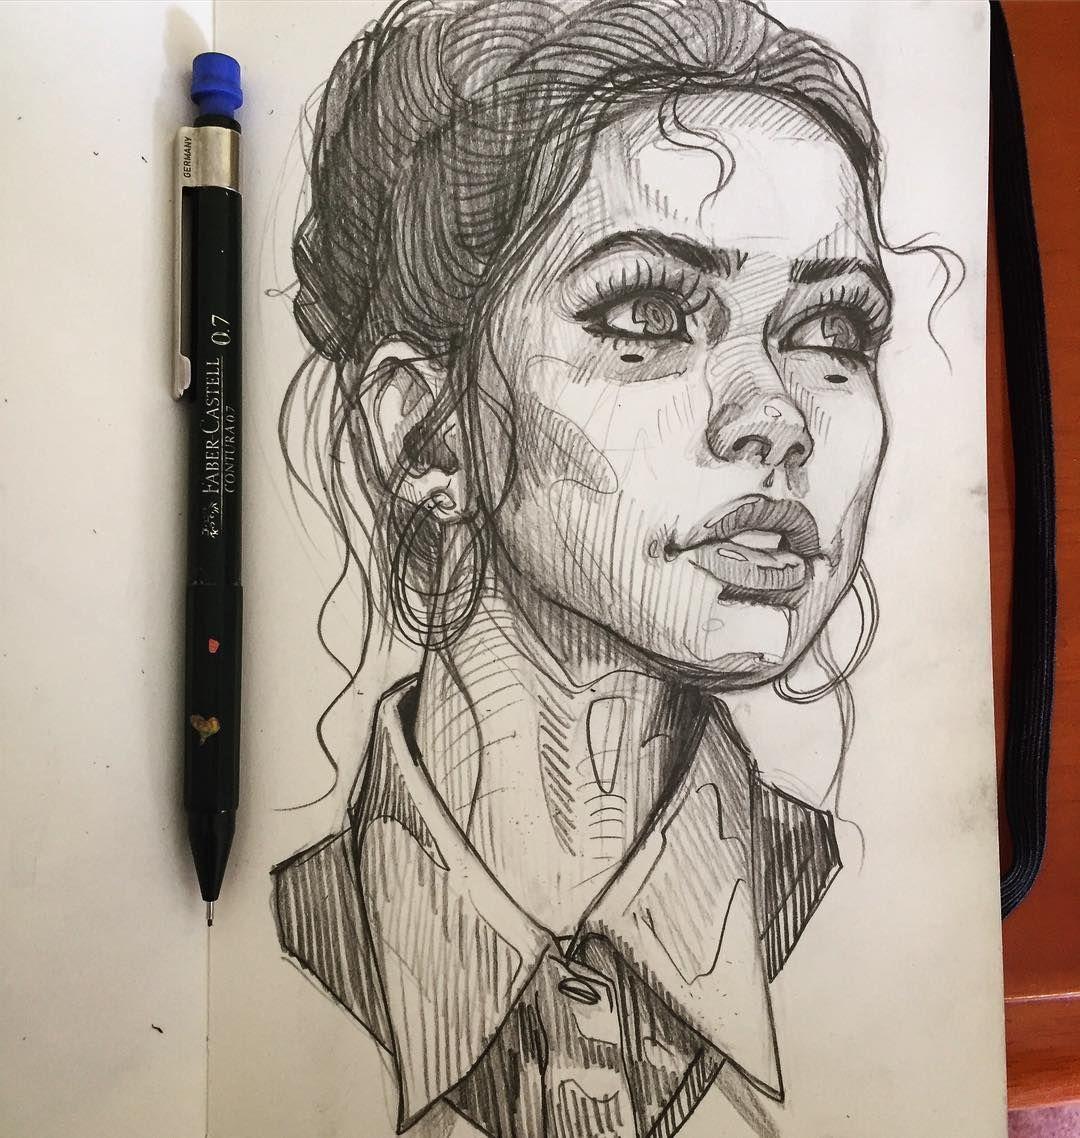 Random sketch girl sexy portrait pencil illustration drawing moleskine ✍ ✍ ✍️